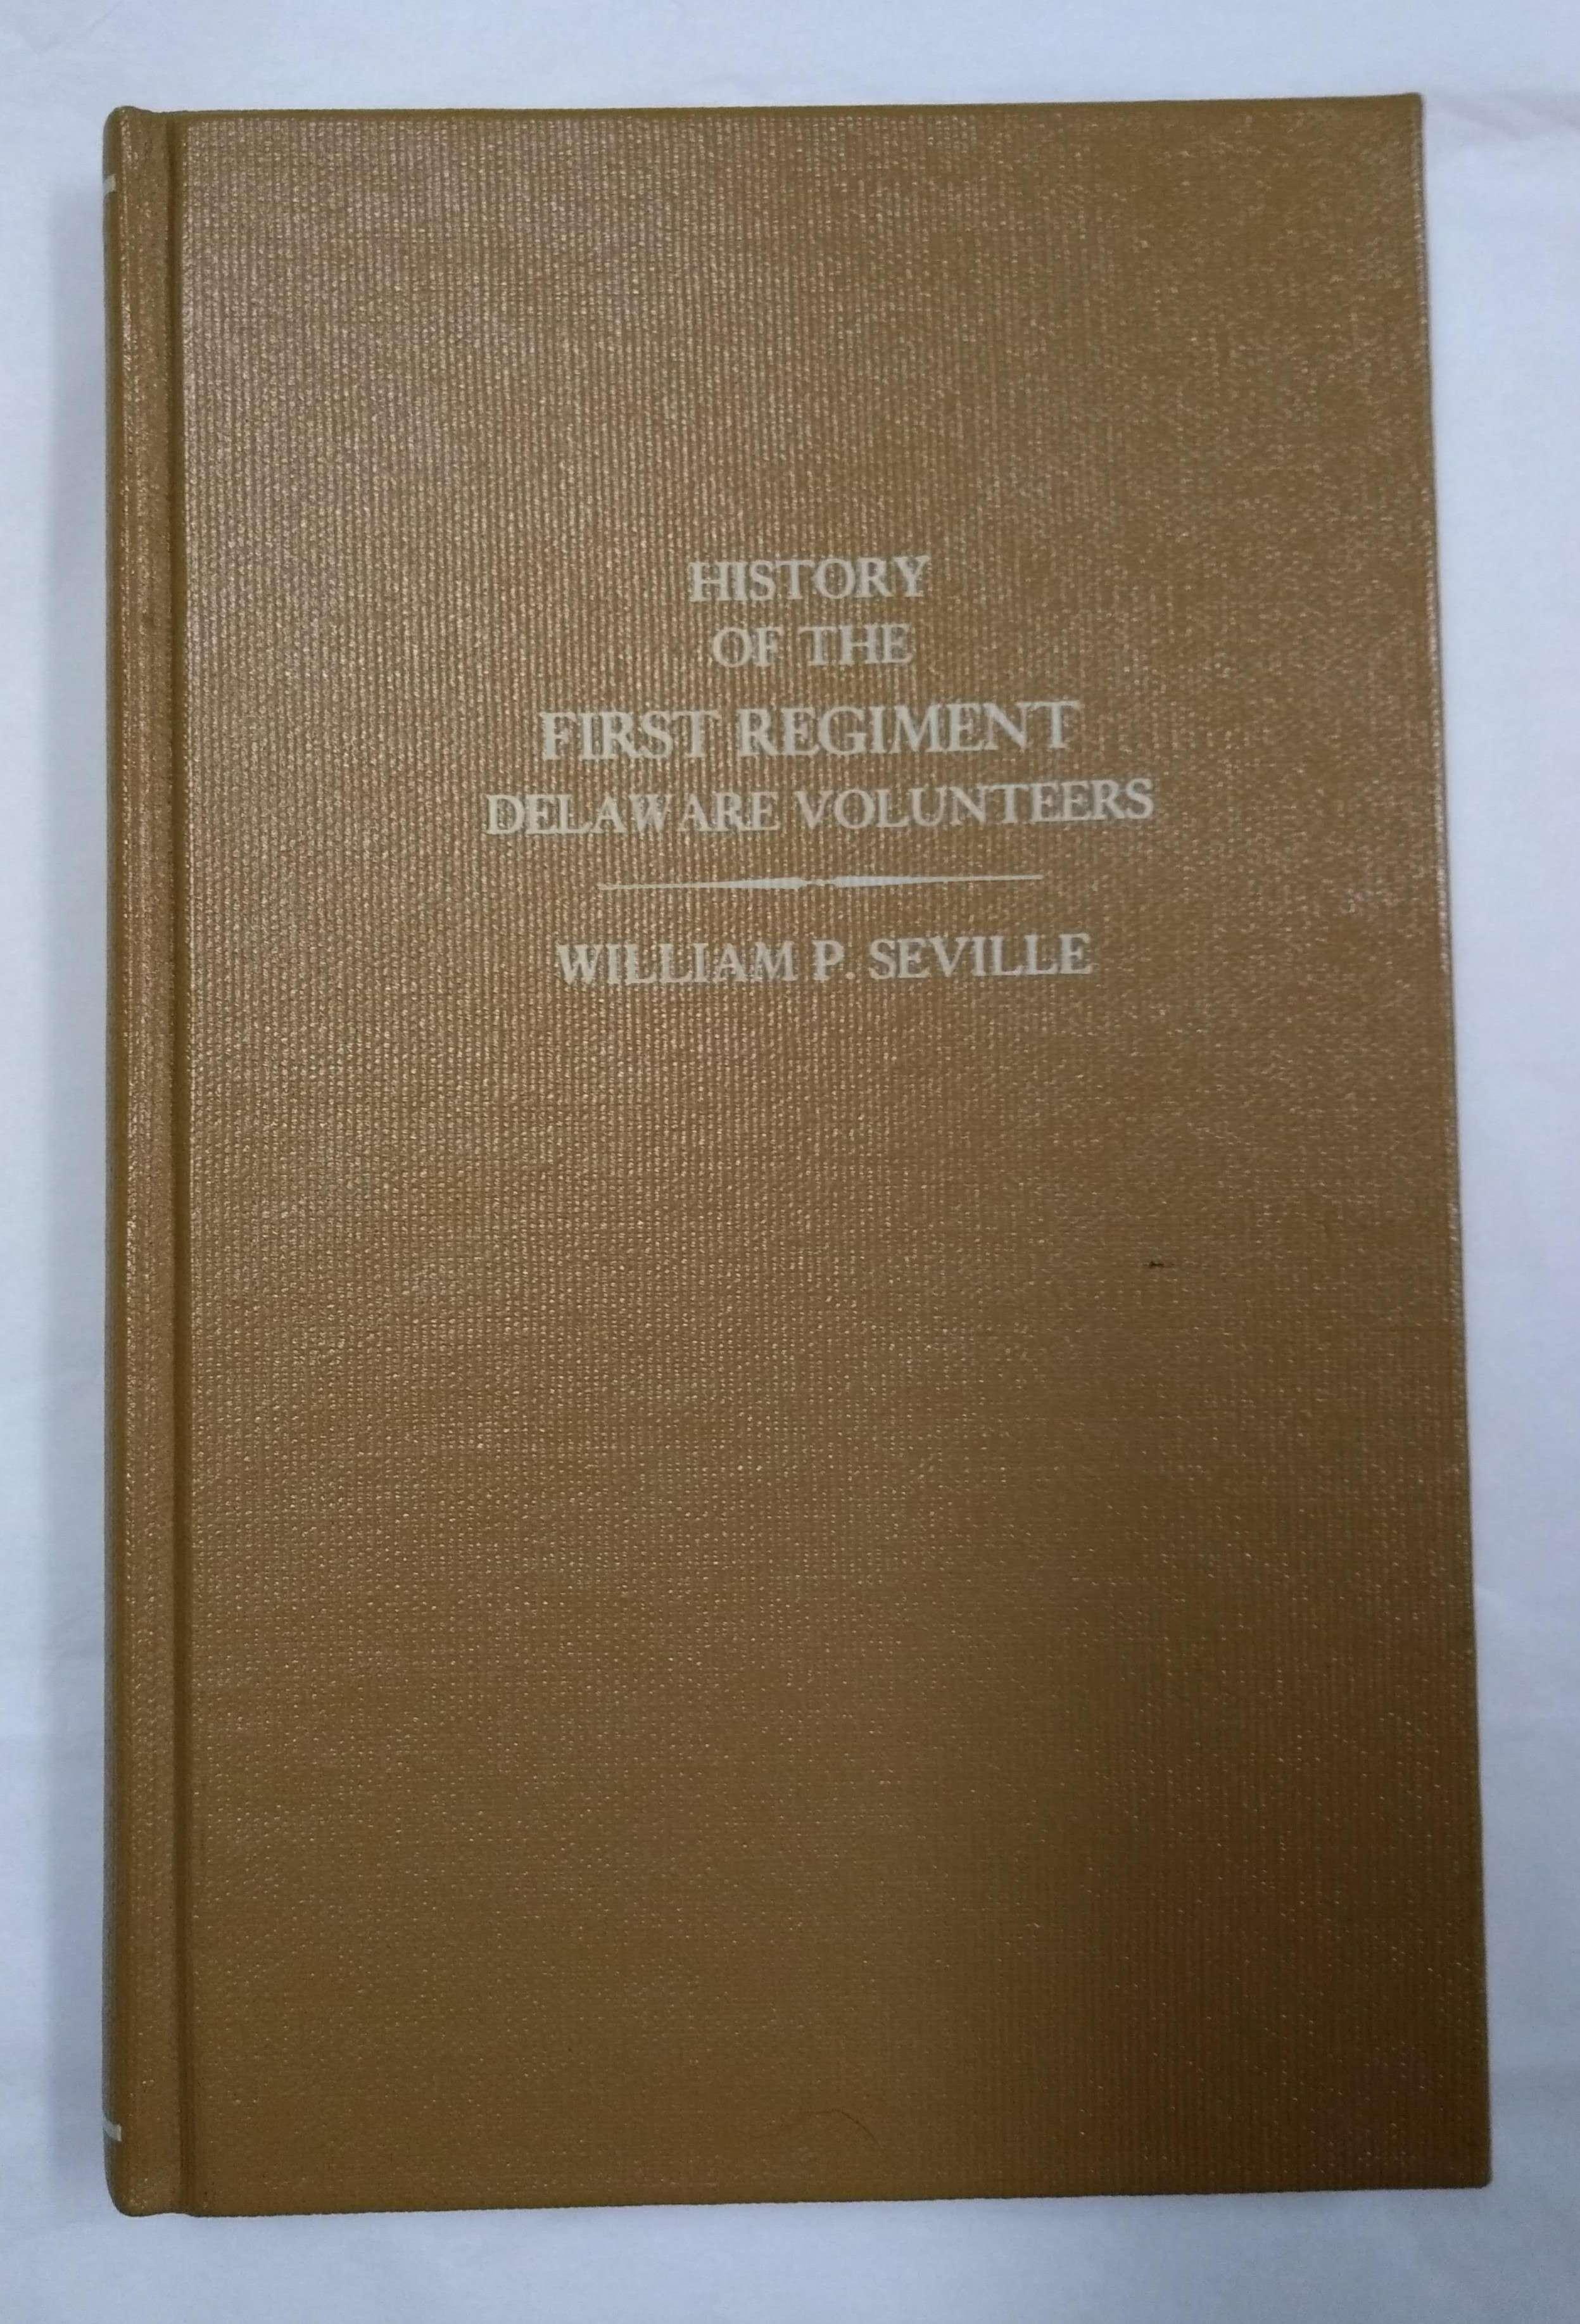 History of 1st Regiment Delaware Volunteers, Seville, Alexander